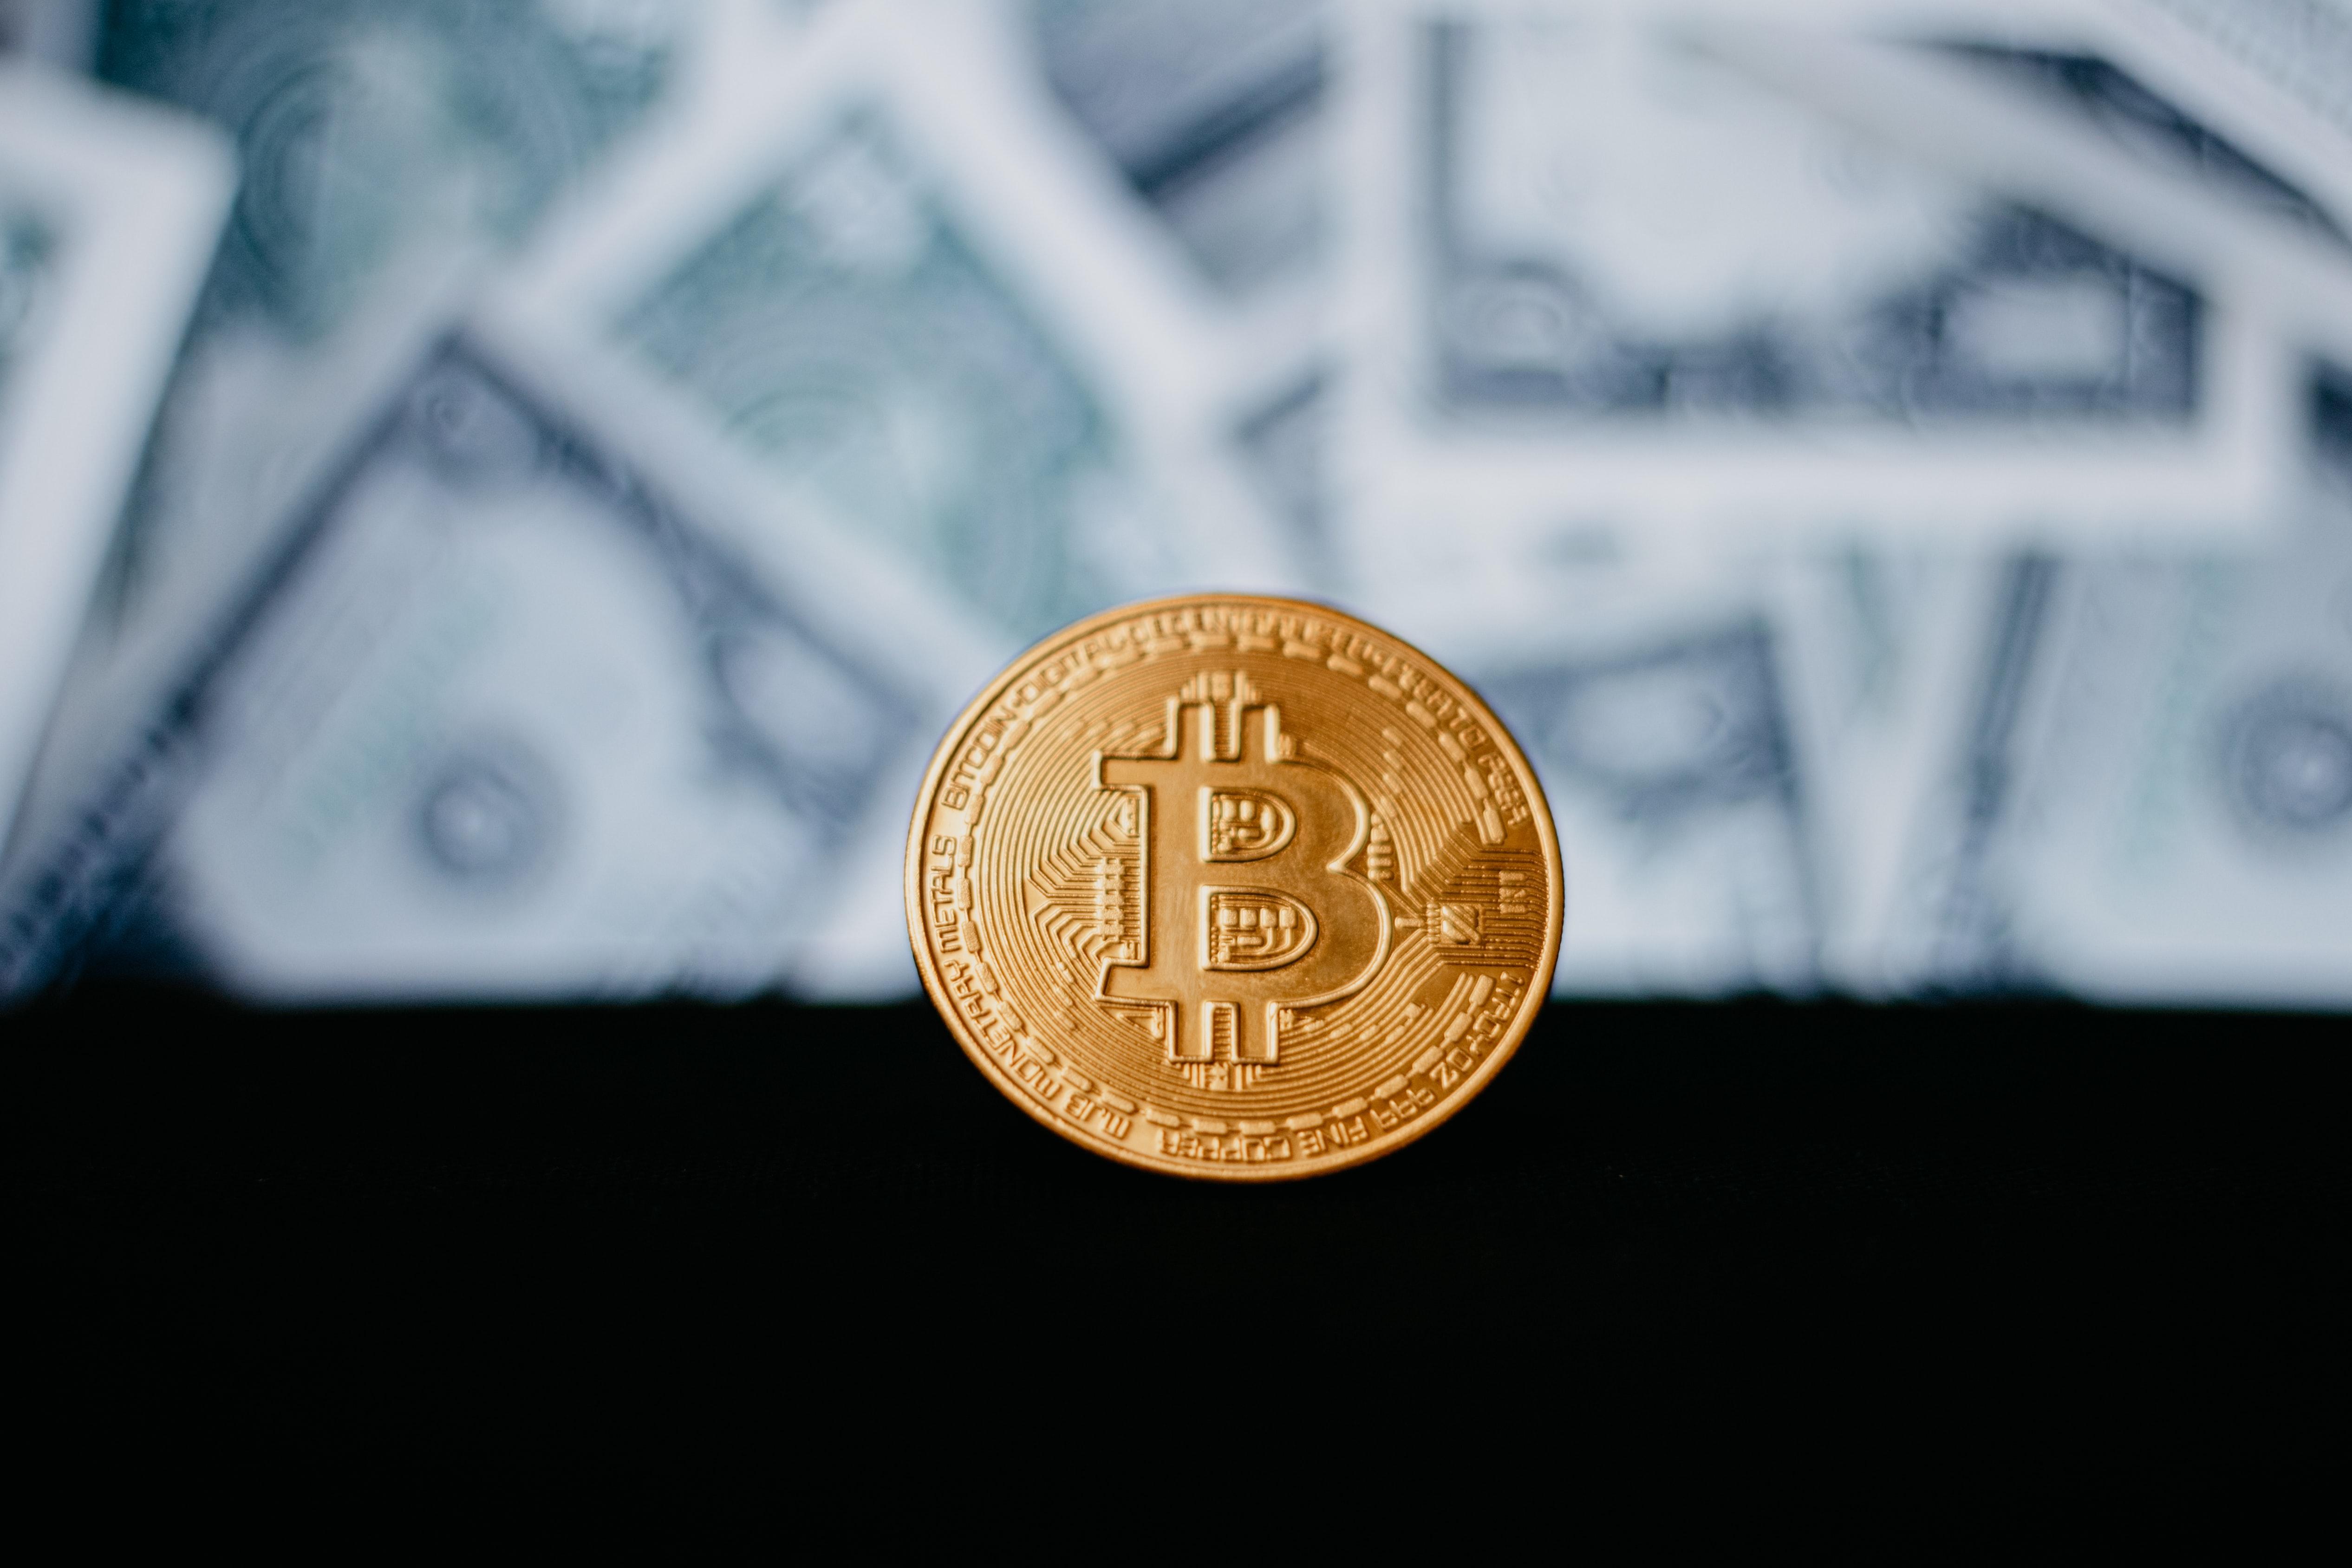 Palantir to Accept Bitcoin Payments, Considers Adding Crypto to Balance Sheet